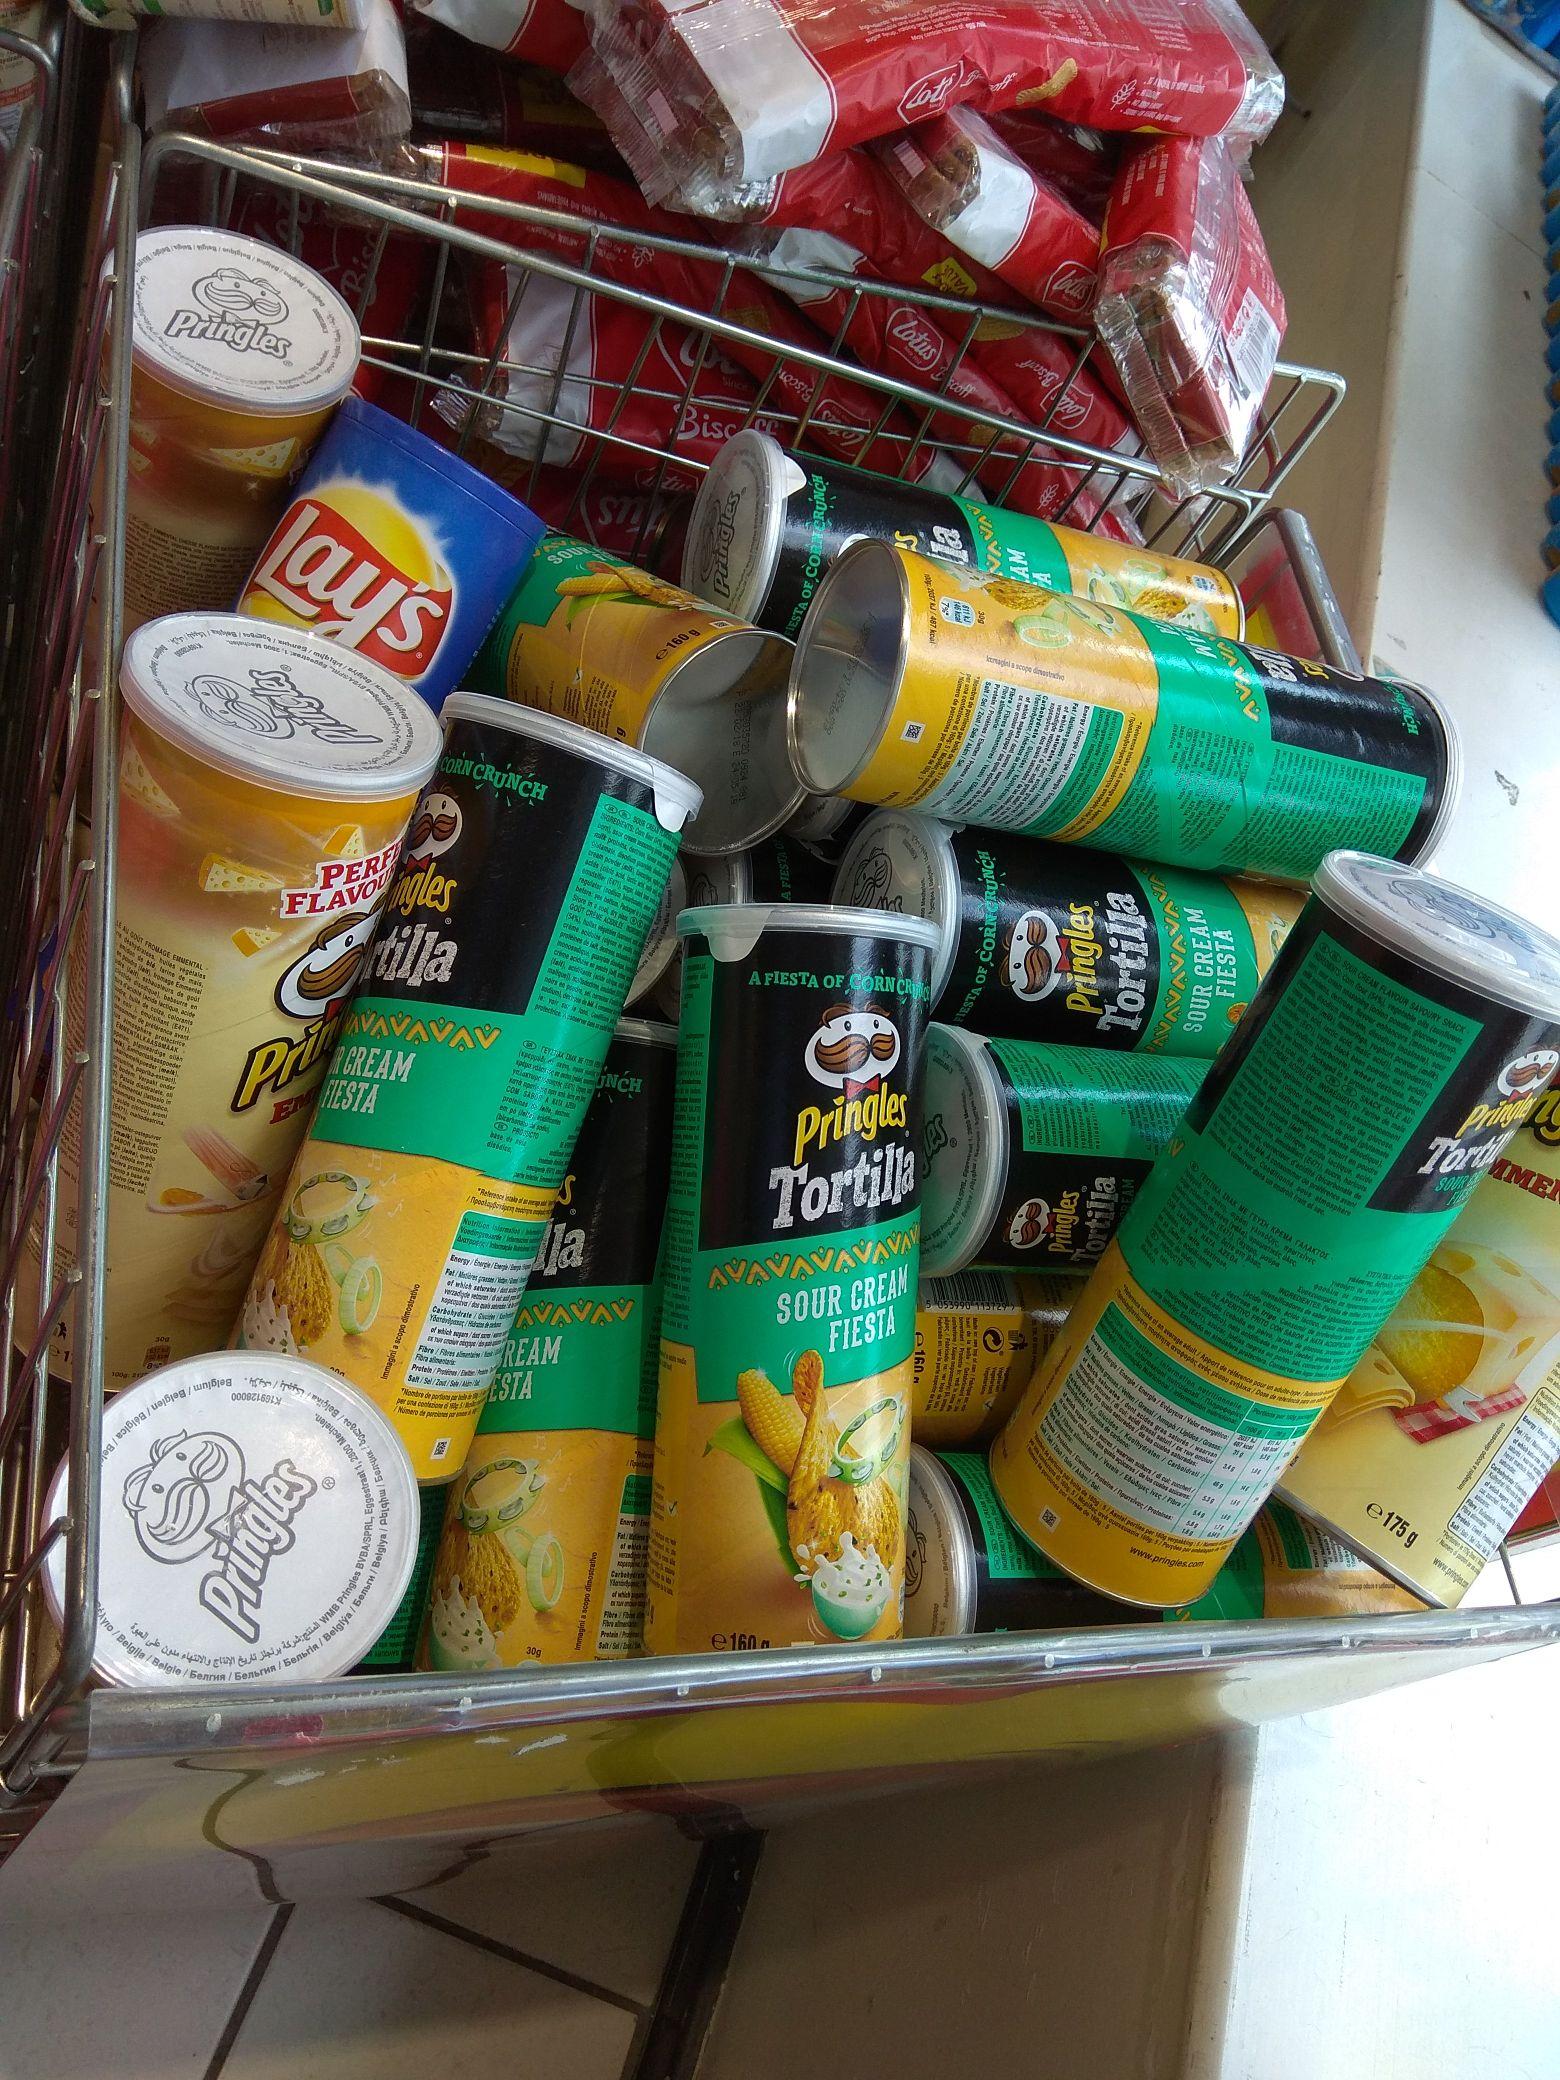 Pringles 175g - £1 @ Poundland